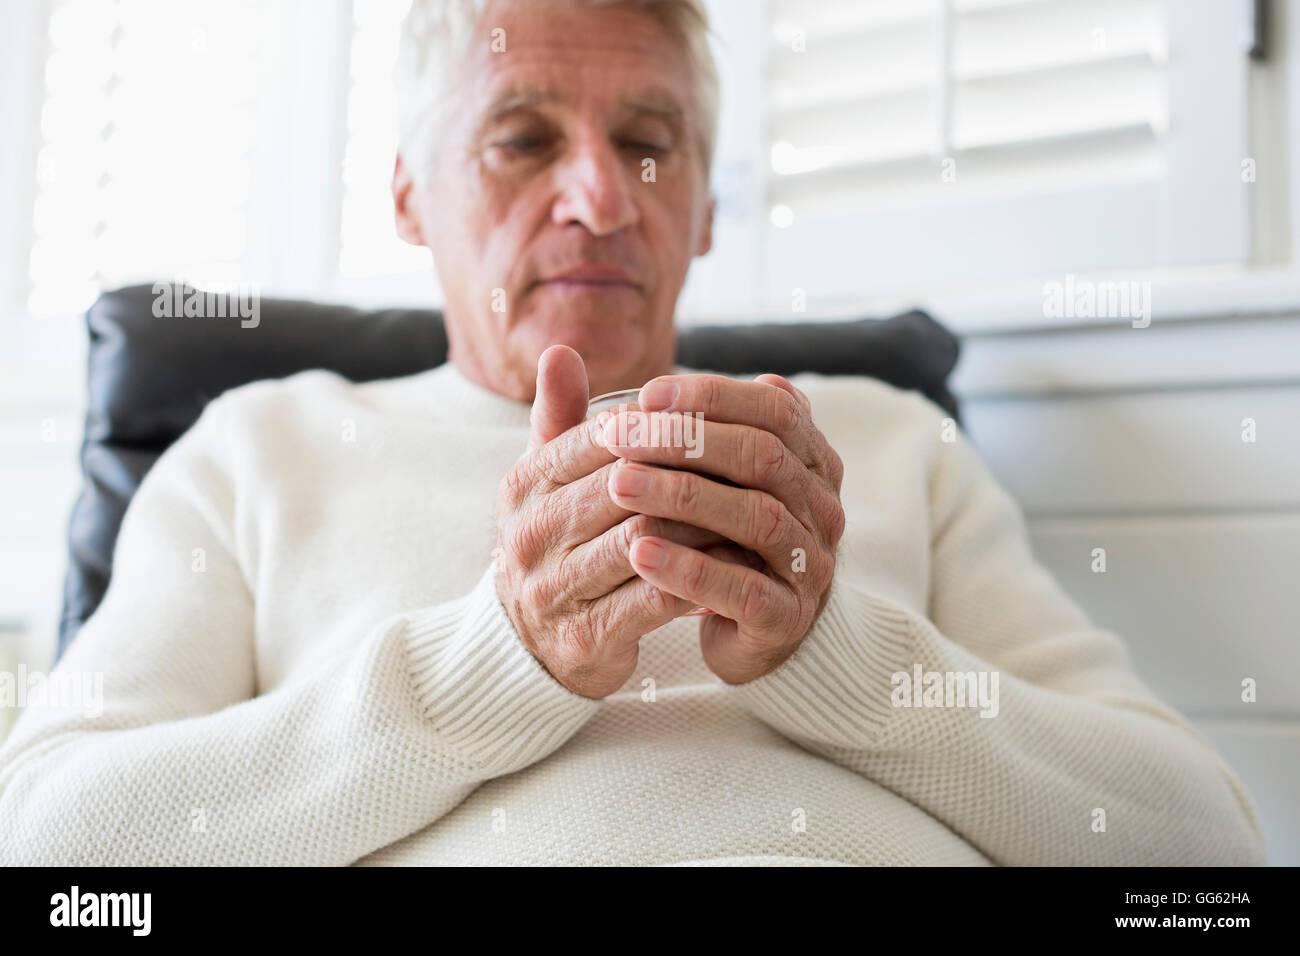 Ältere Mann hält eine Tasse Tee Stockbild